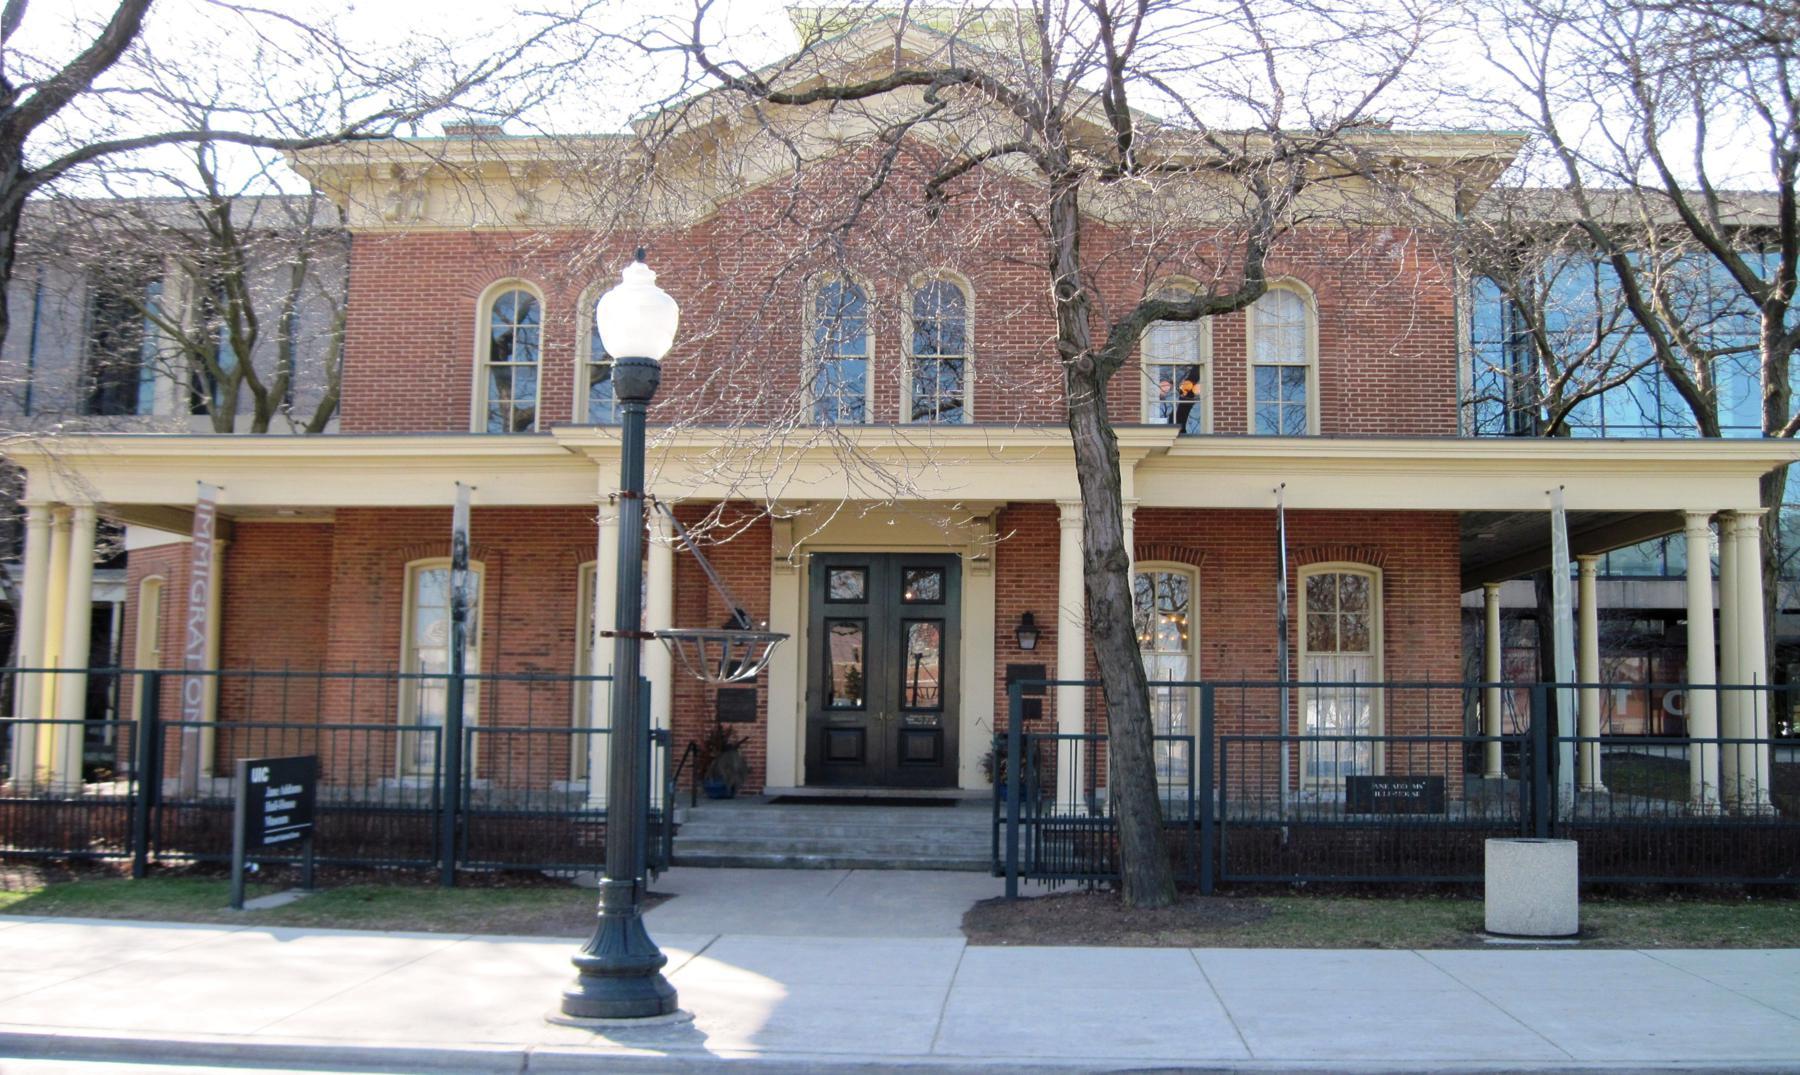 Casas embrujadas III: Hull house, Chicago